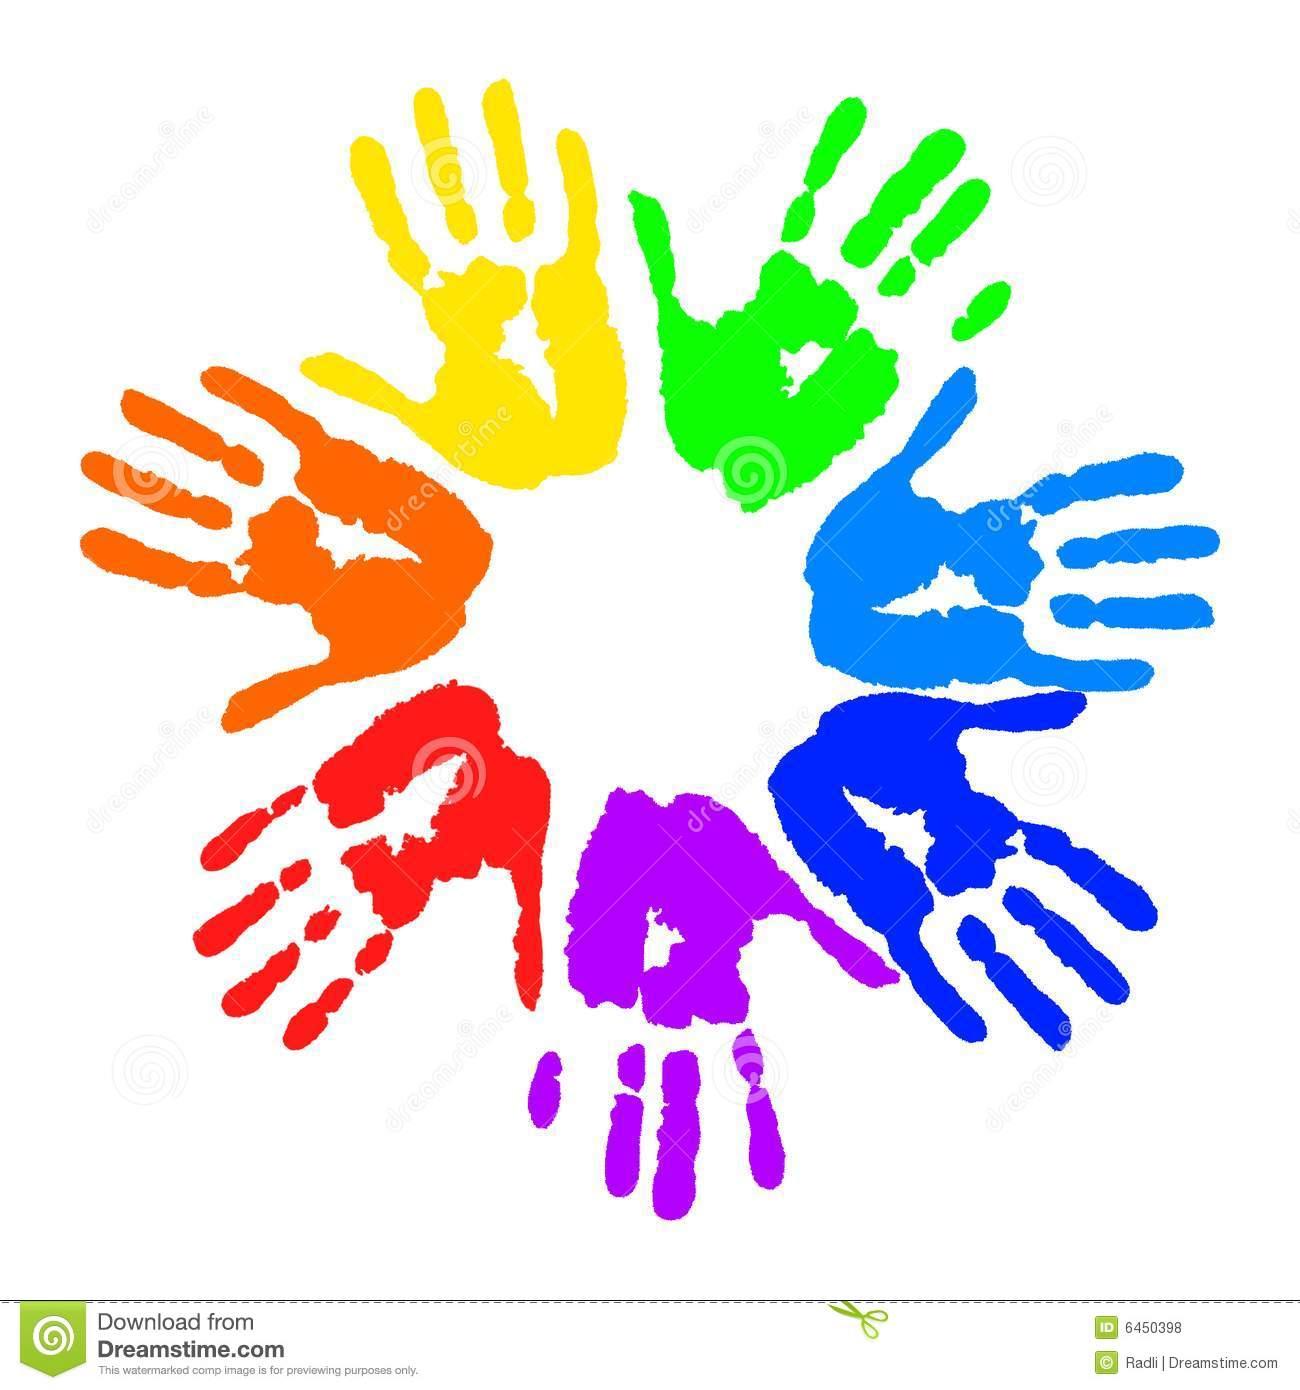 Preschool clipart. Kids handprint panda free